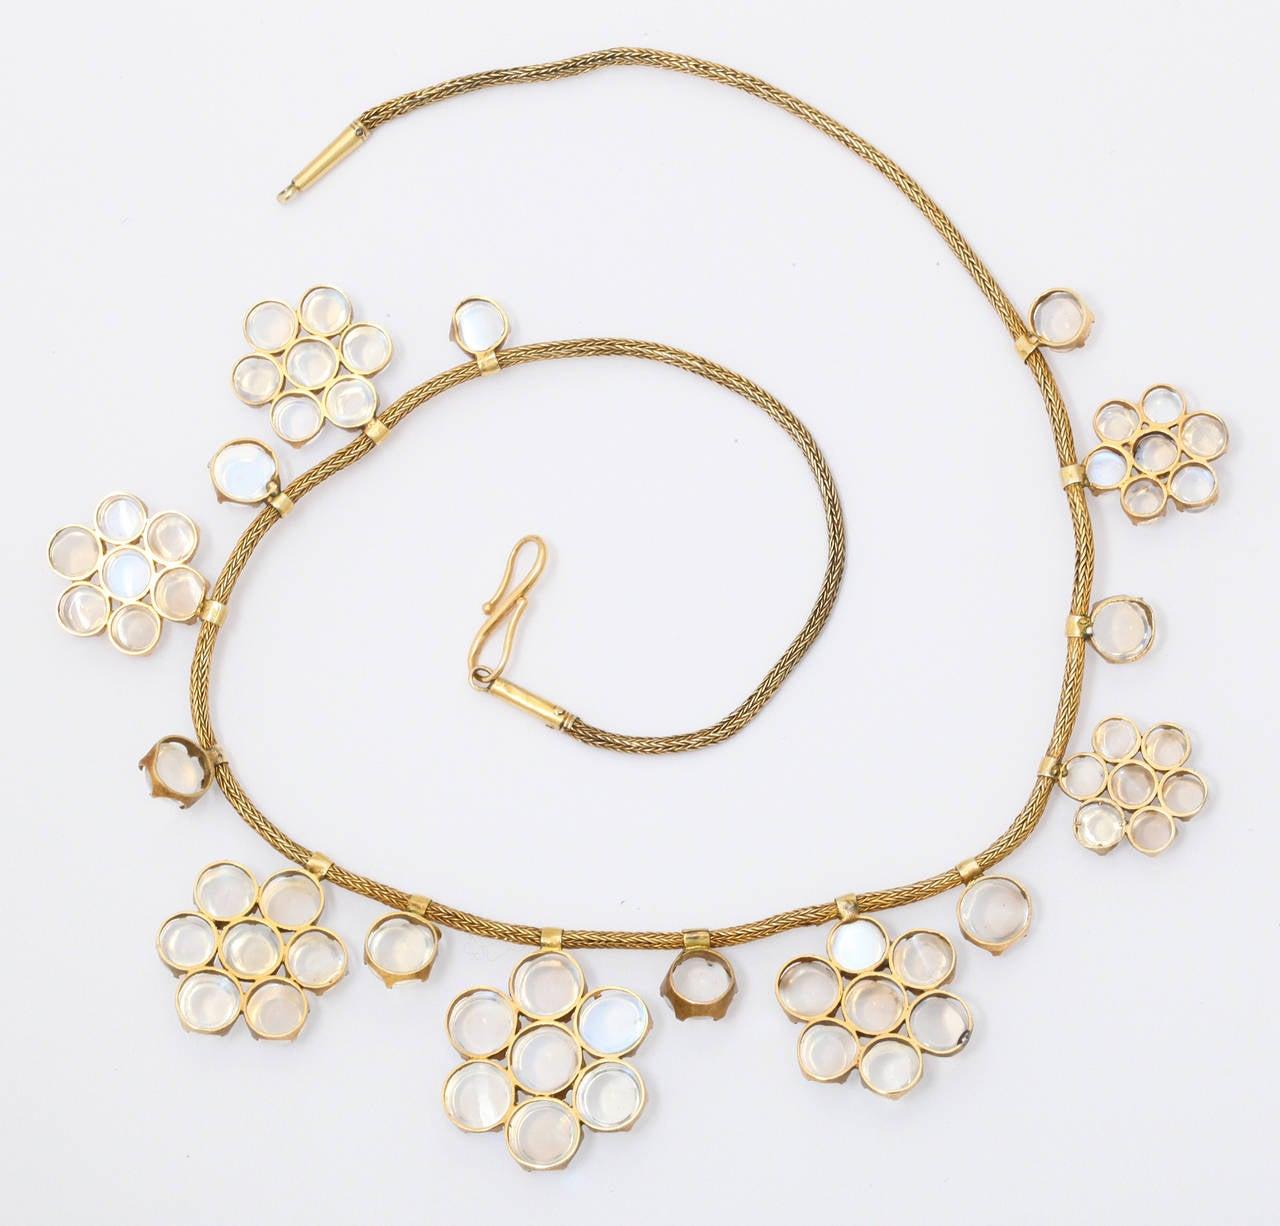 Women's Antique Moonstone Gold Necklace For Sale